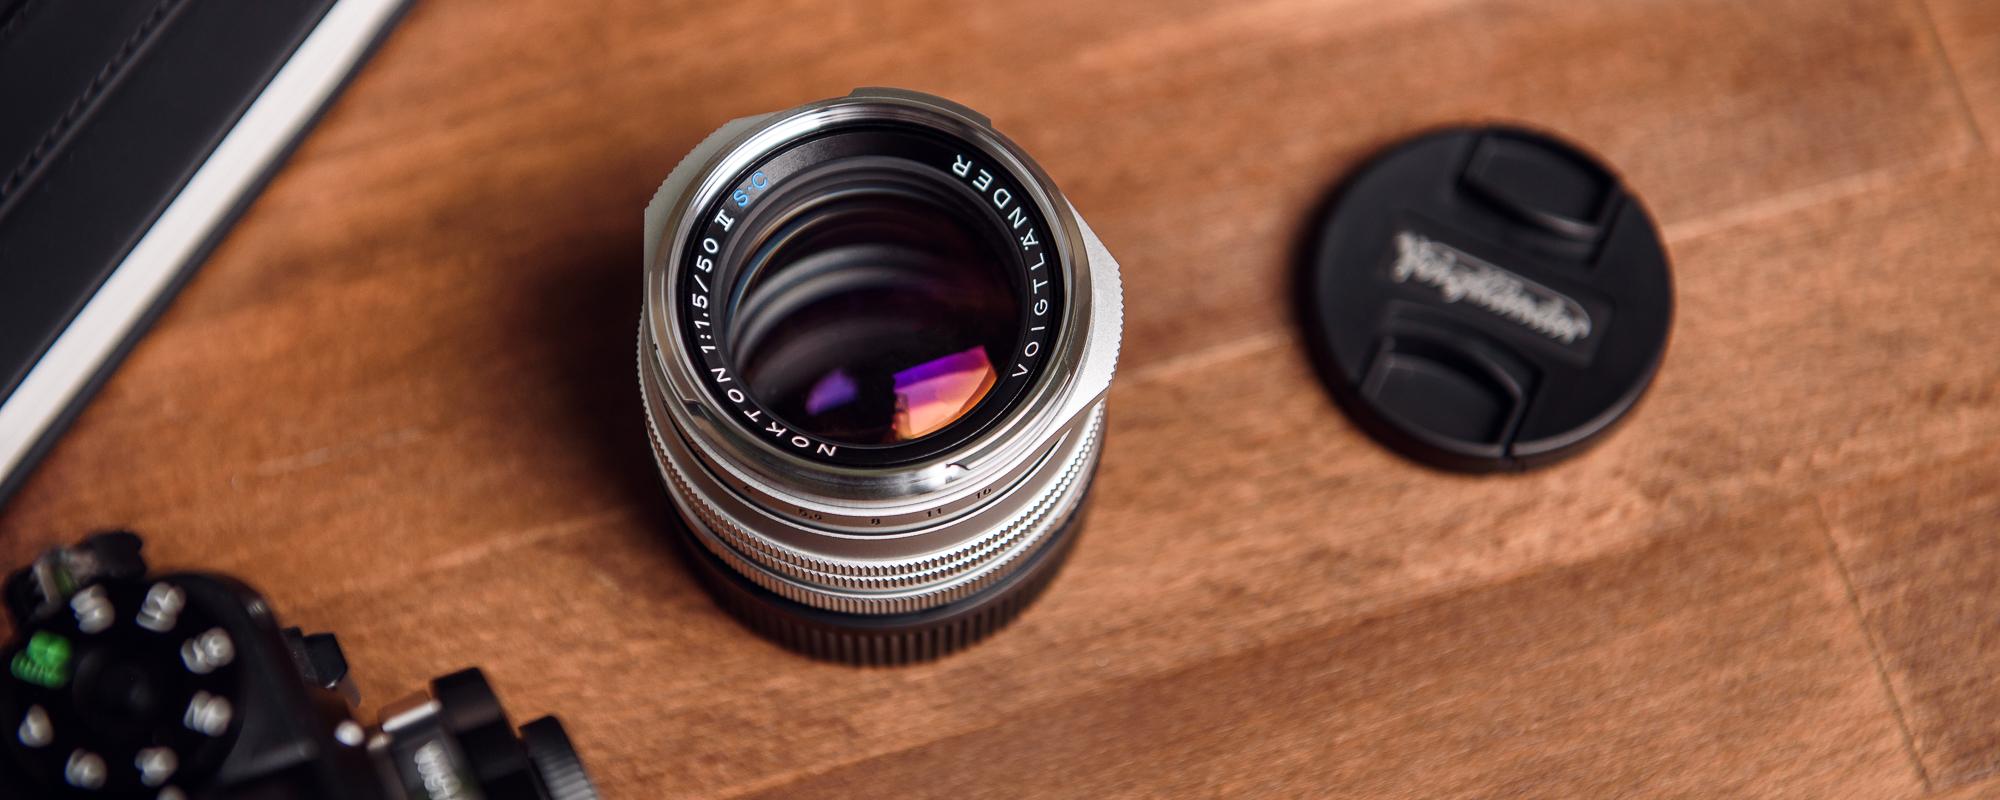 Voigtlander Nokton II 50 mm f/1.5 lens for Leica M - SC coating